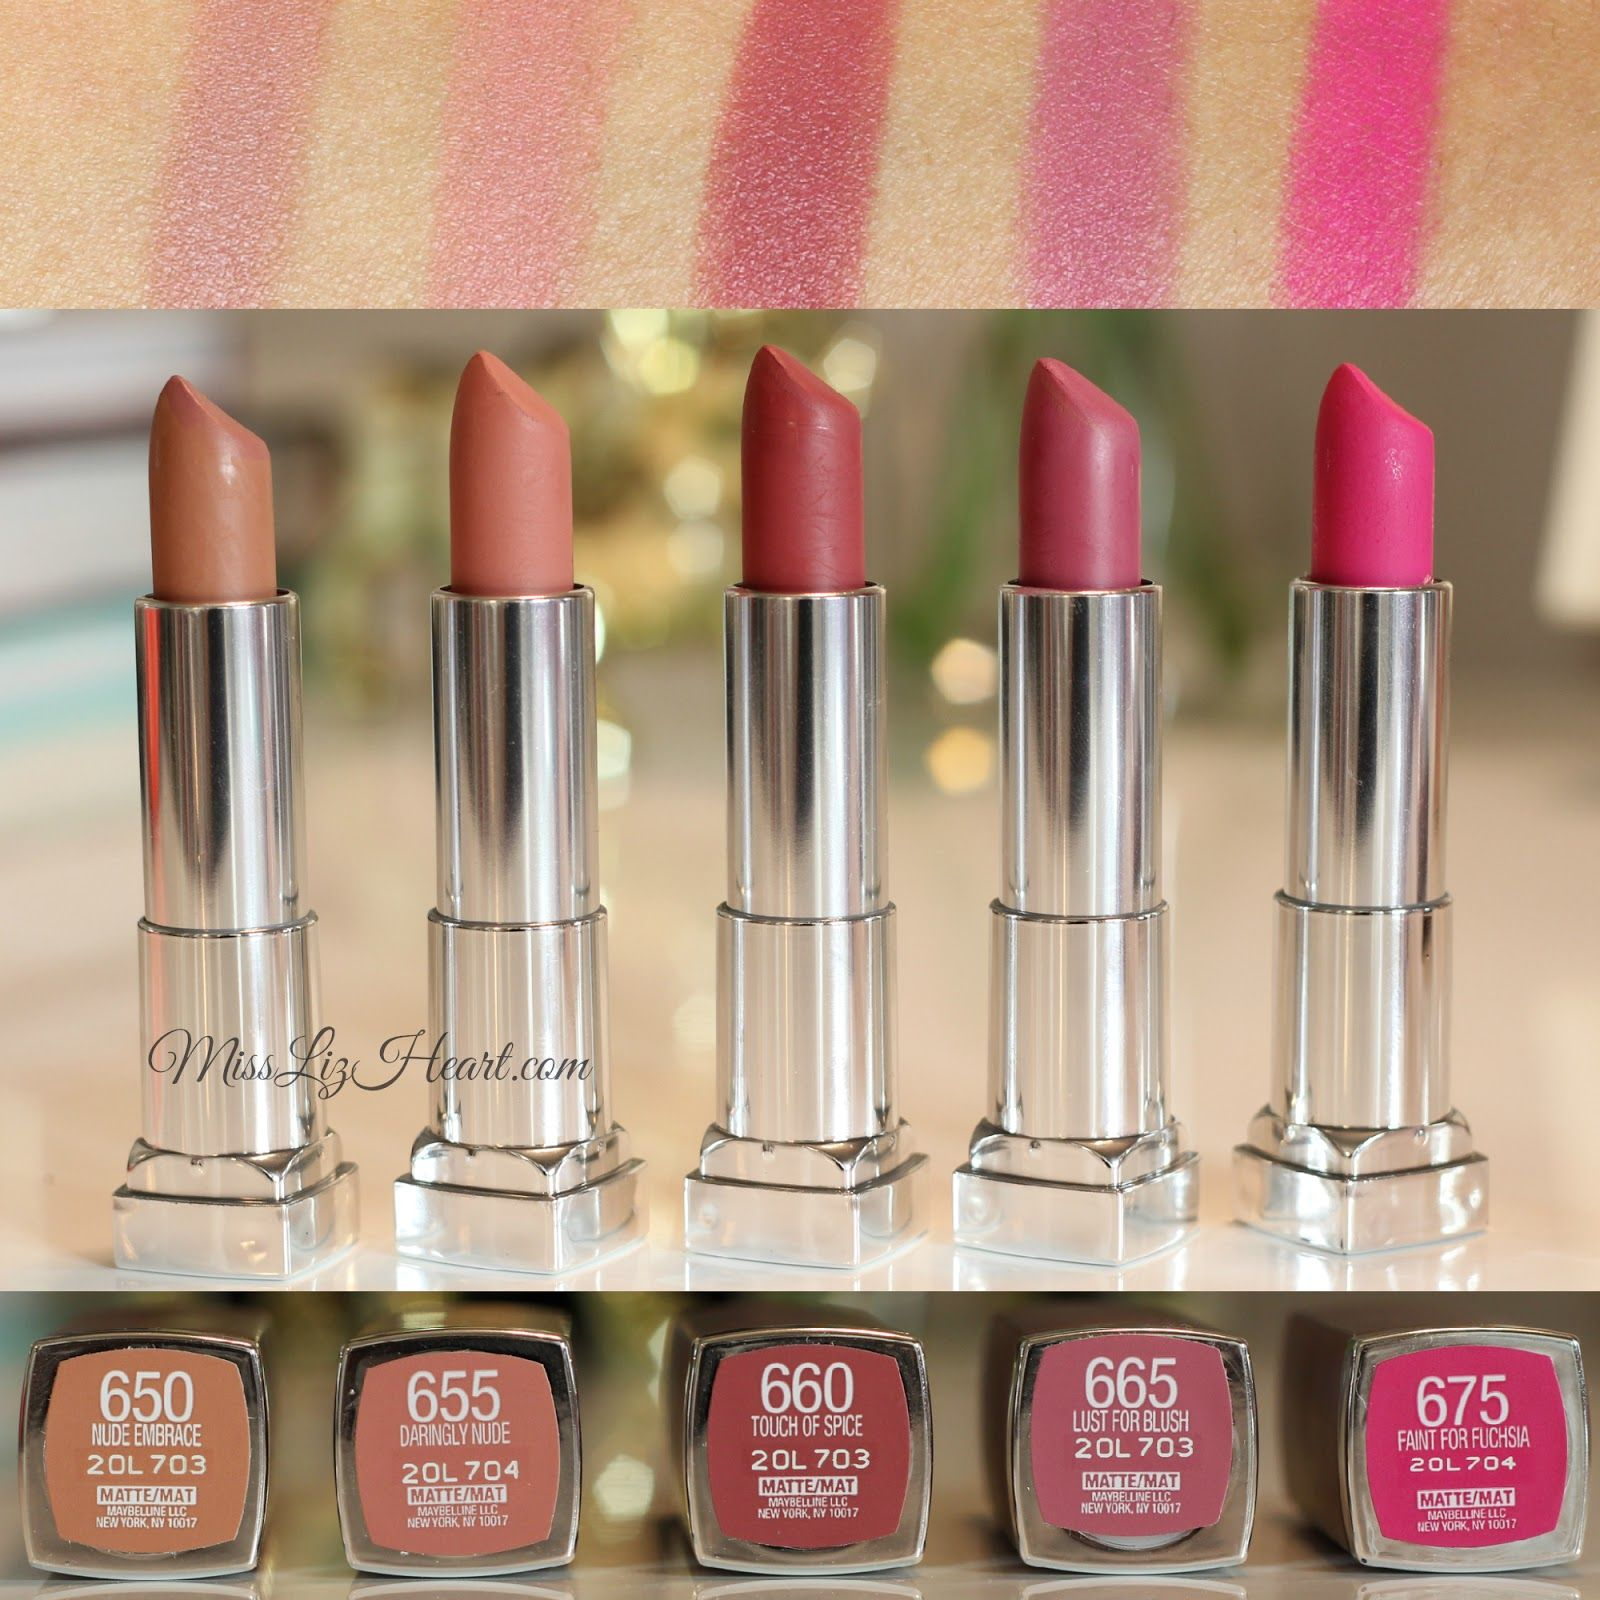 13 Sensational Schemes That Are: New Maybelline Color Sensational Creamy Matte Lipstick